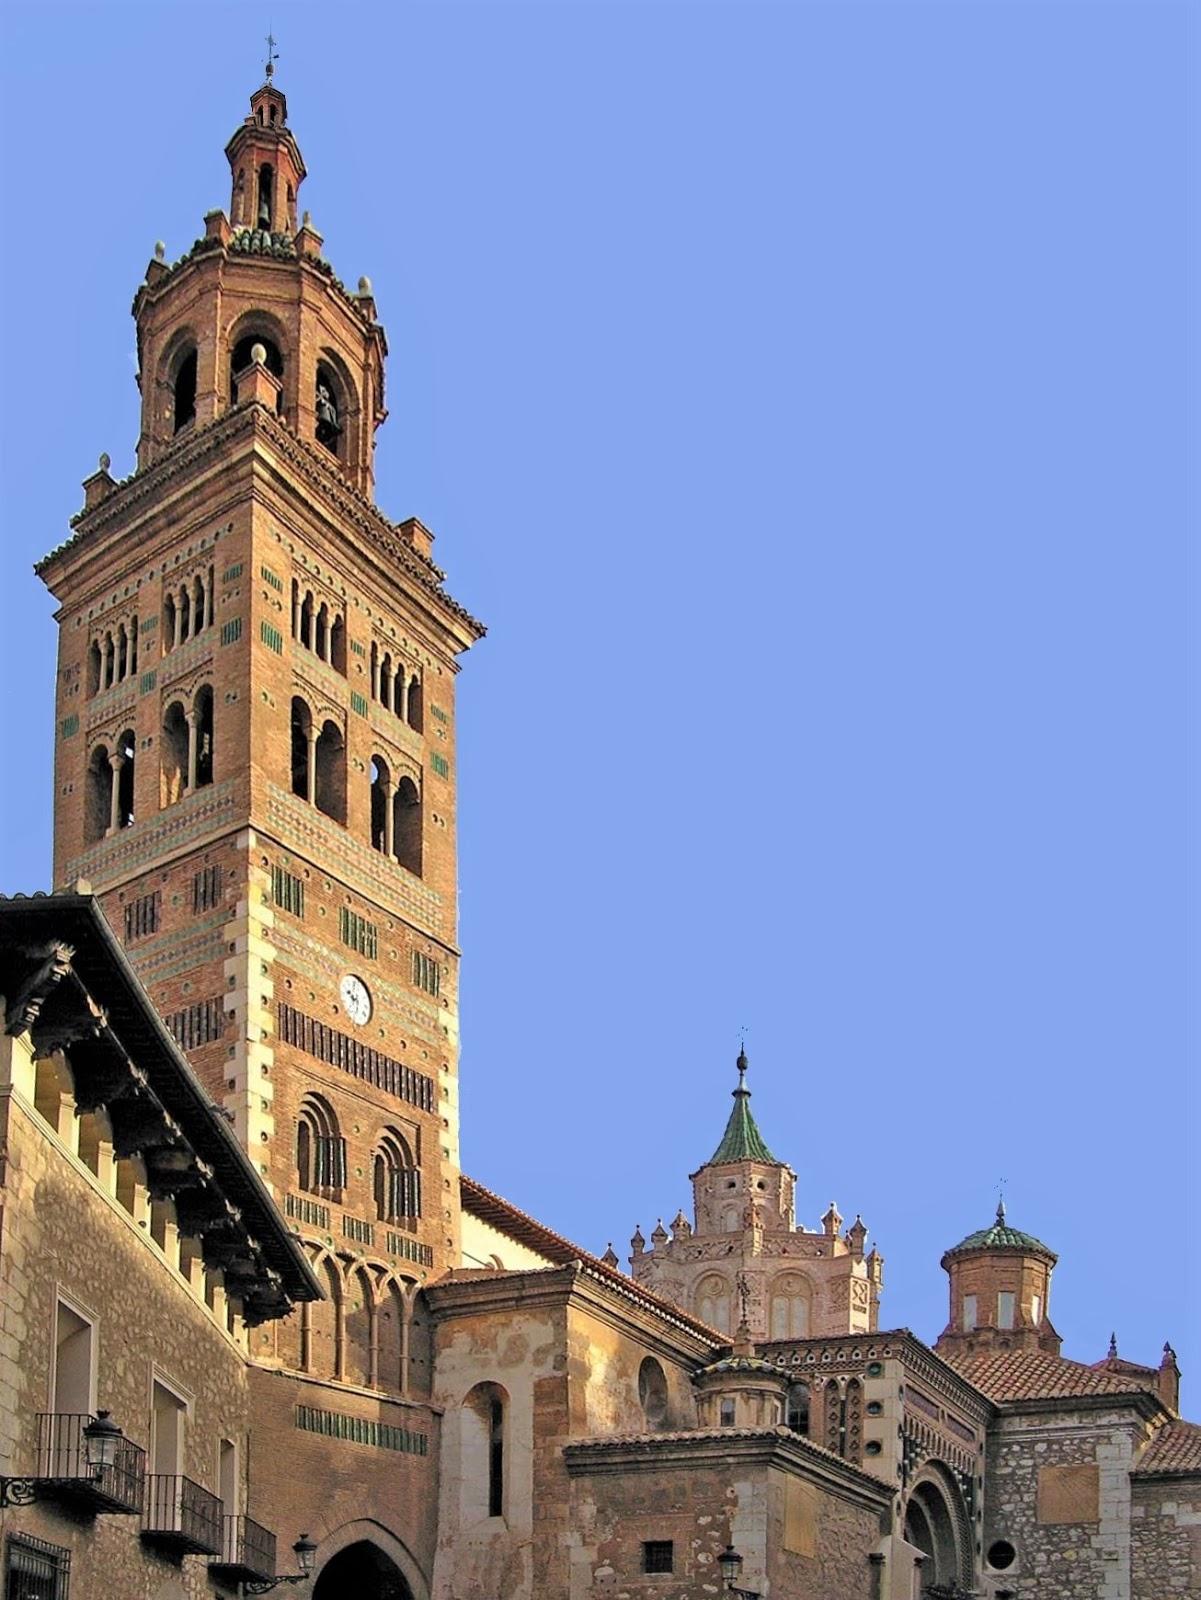 Cattedrale di Santa Maria di Mediavilla